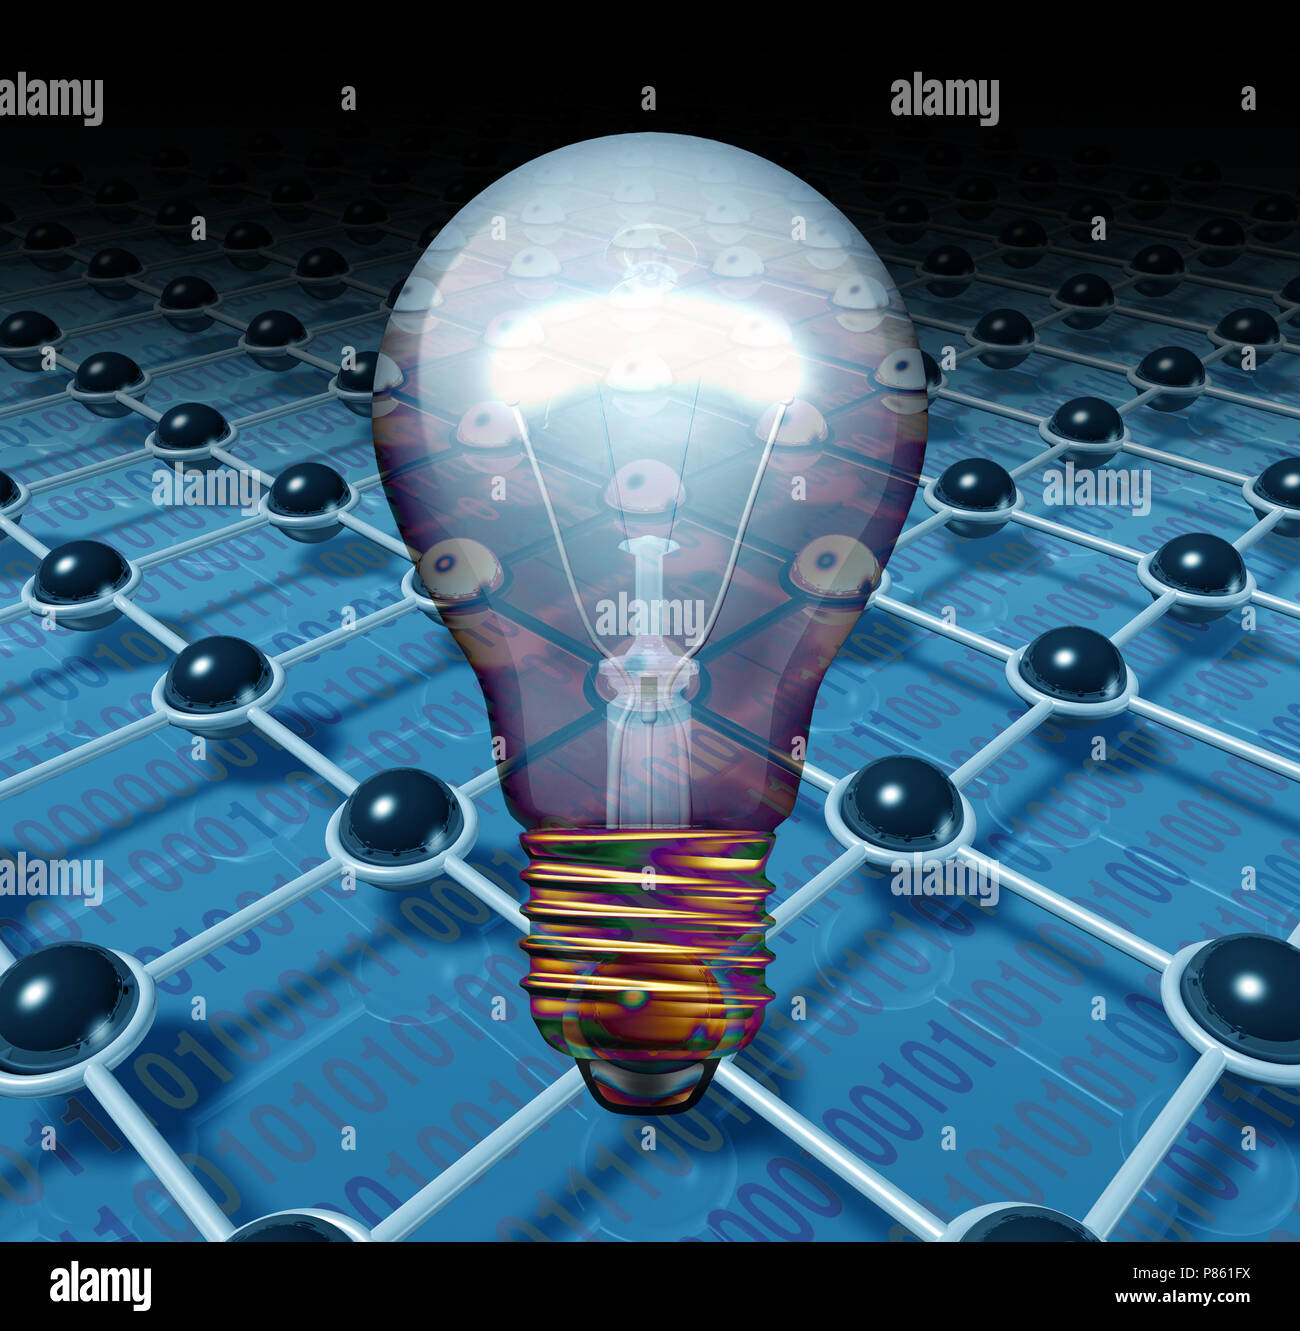 Solución de software Tecnología de futuro la idea creativa como un concepto abstracto como un símbolo de conexión3D Render. Imagen De Stock